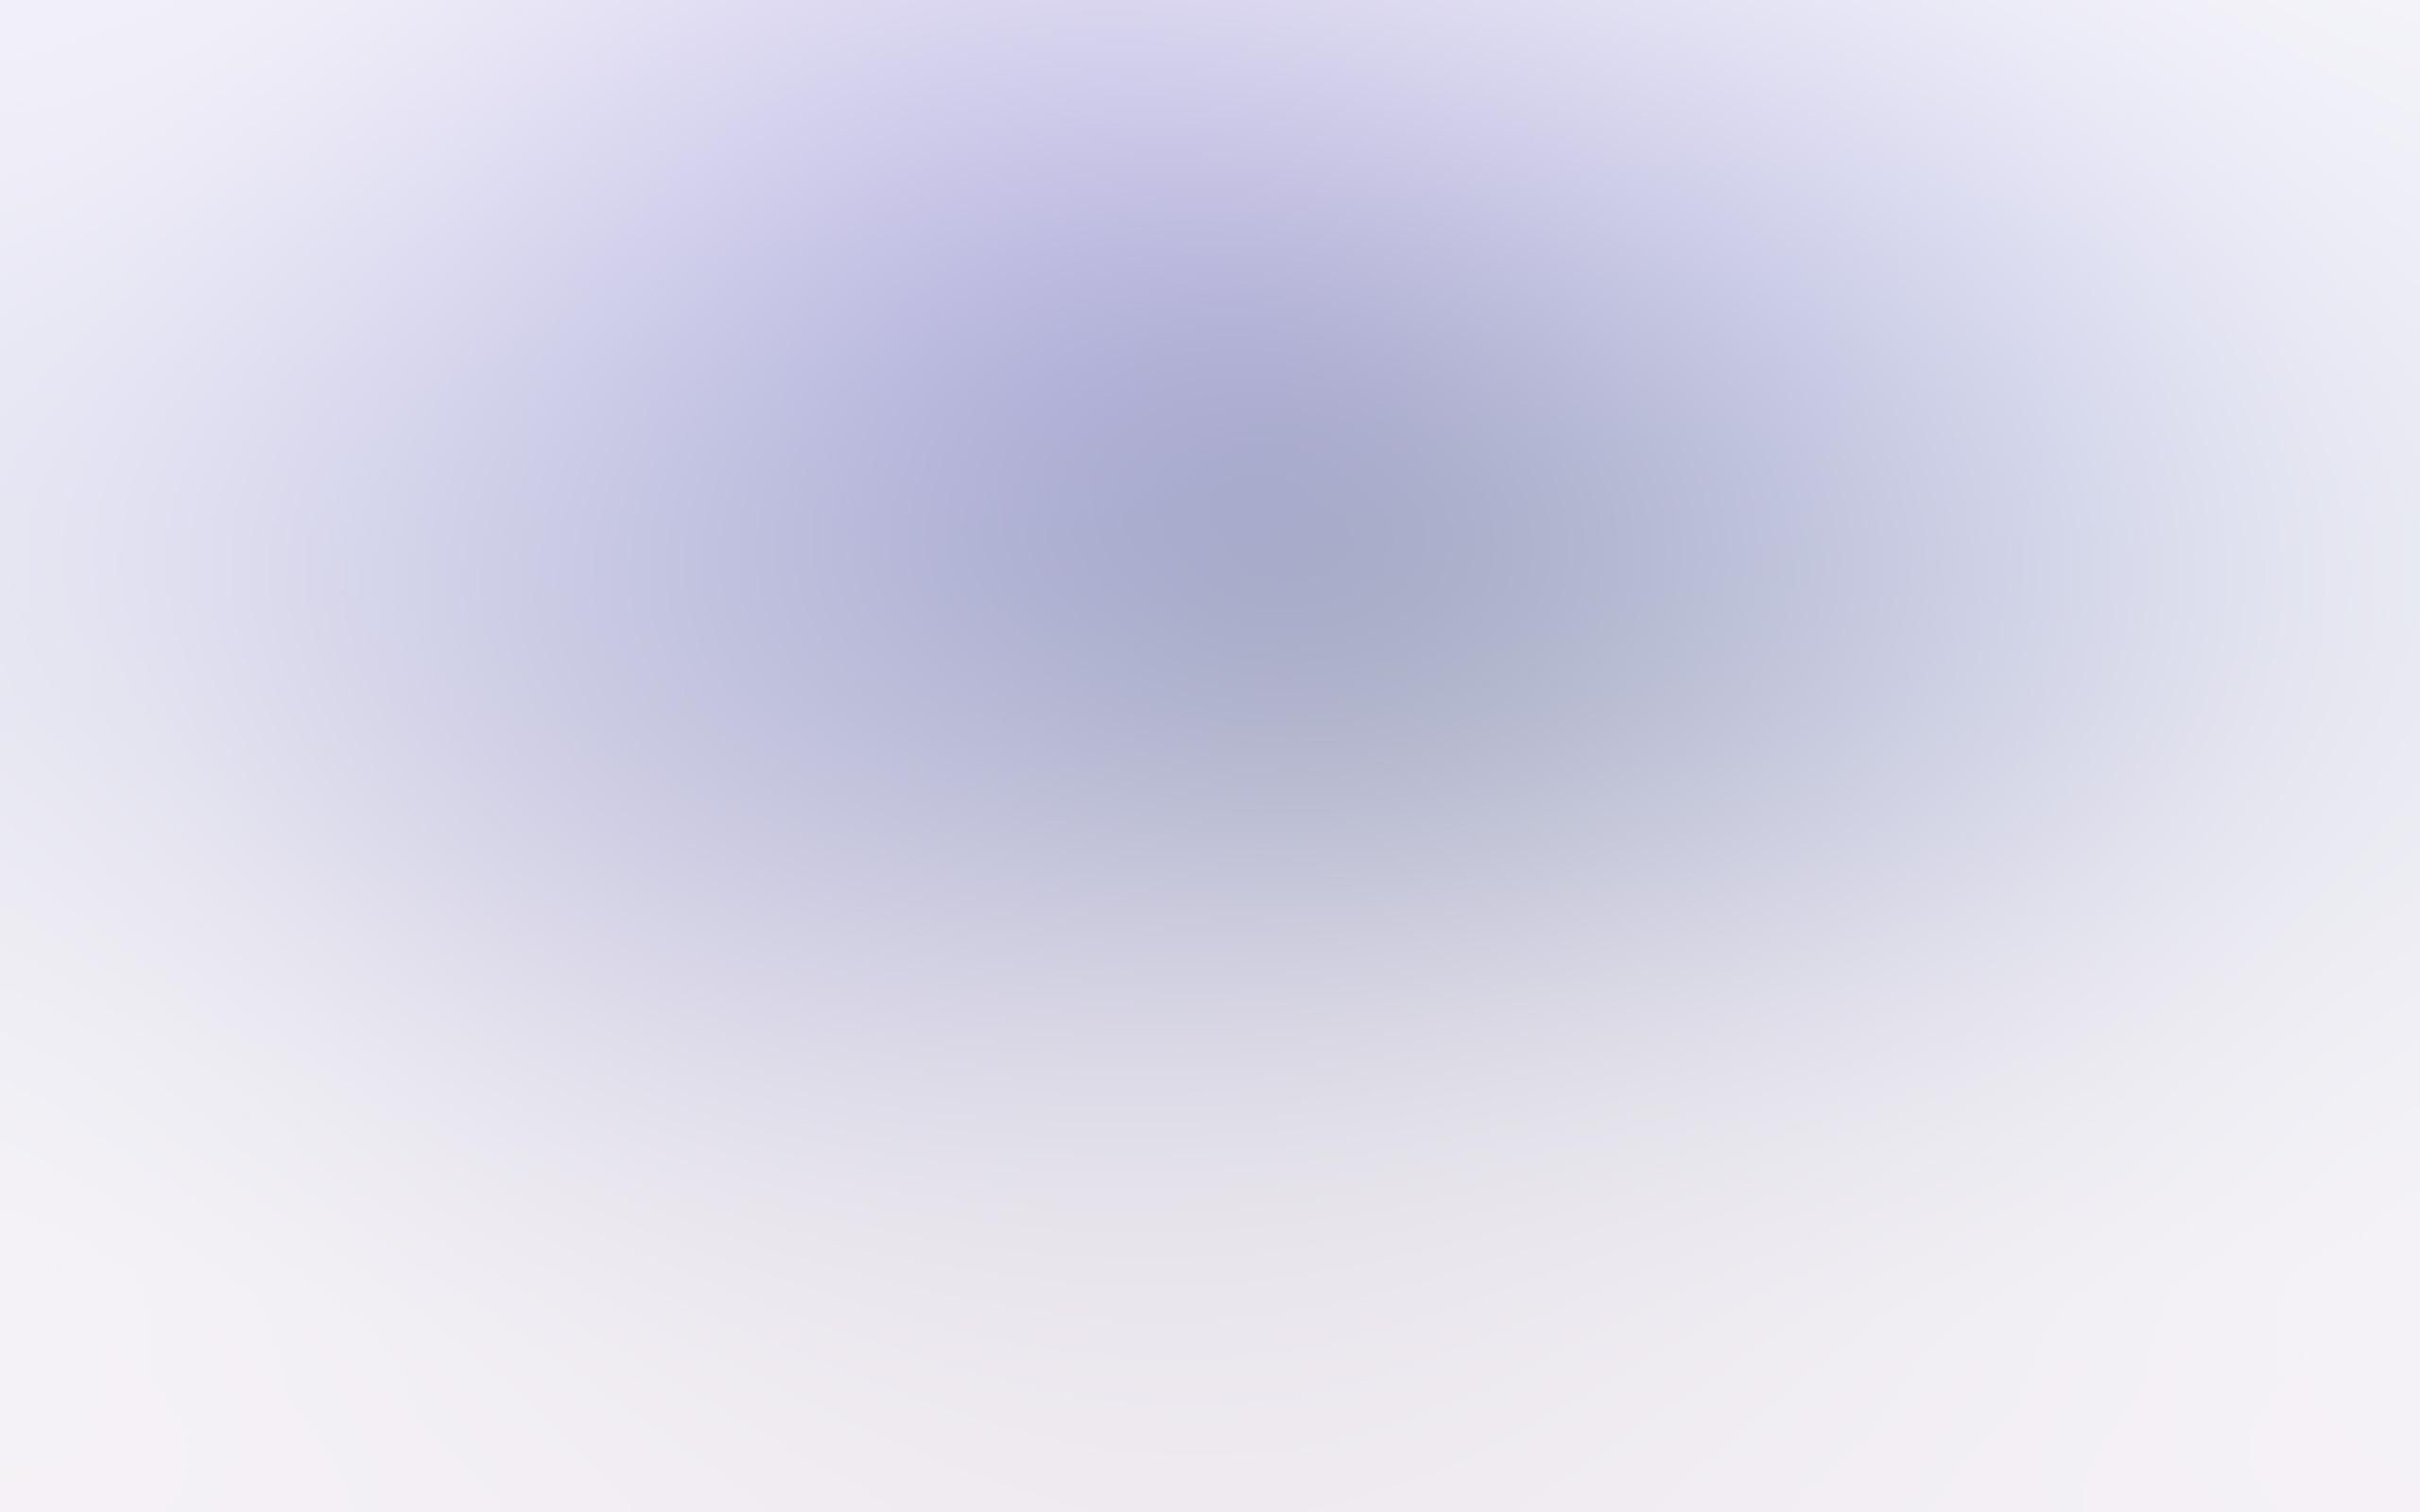 Si89 White Gray Blue Soft Pastel Gradation Blur Wallpaper